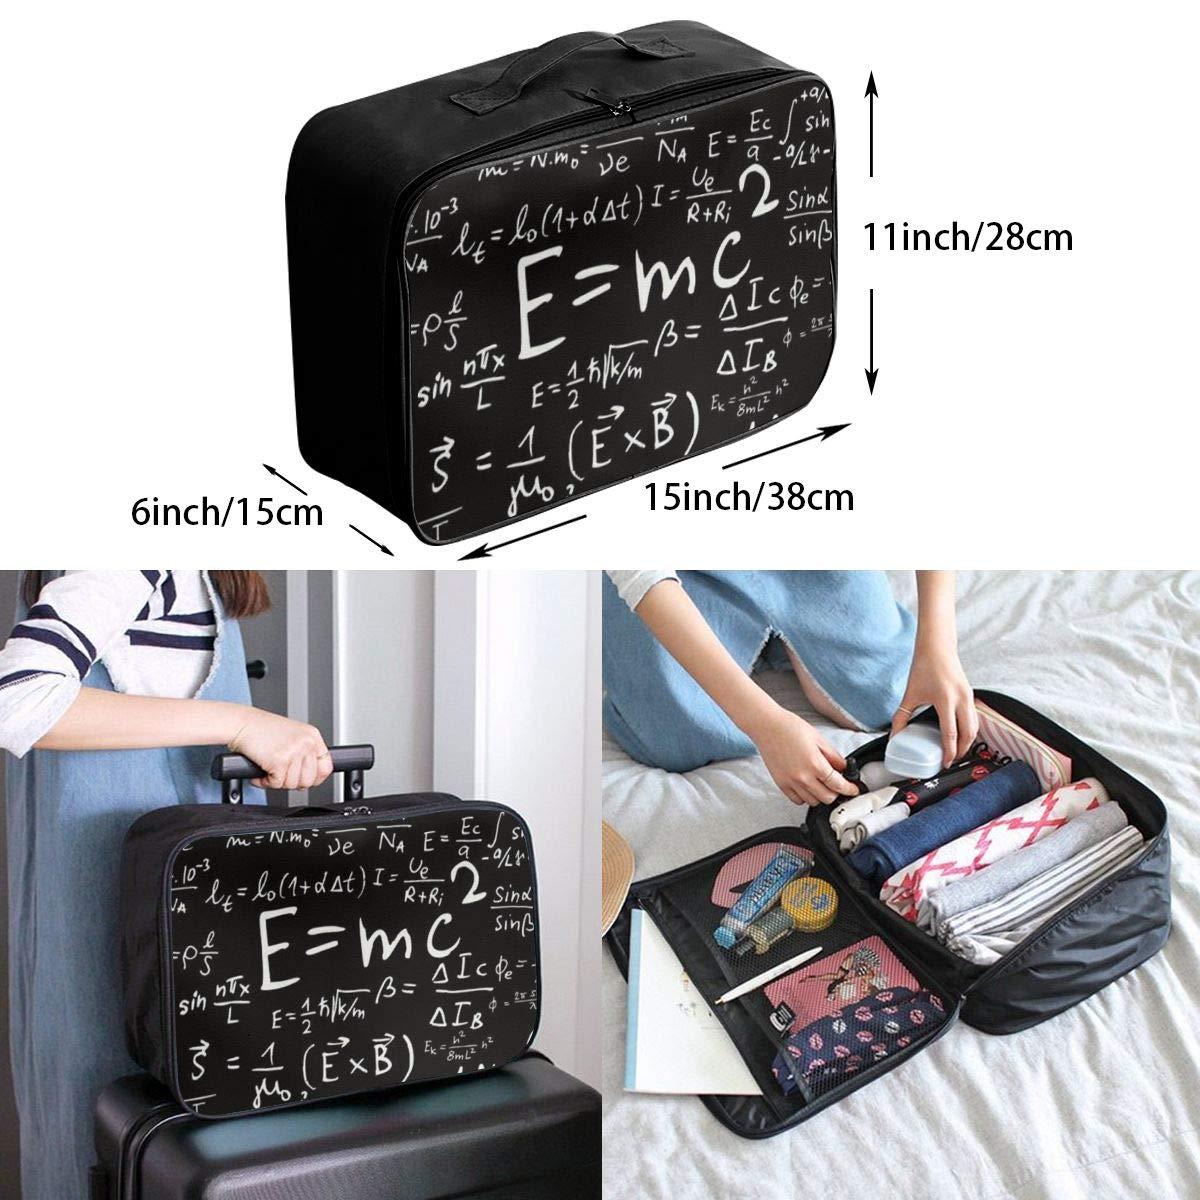 YueLJB Mathematical Formula Lightweight Large Capacity Portable Luggage Bag Travel Duffel Bag Storage Carry Luggage Duffle Tote Bag